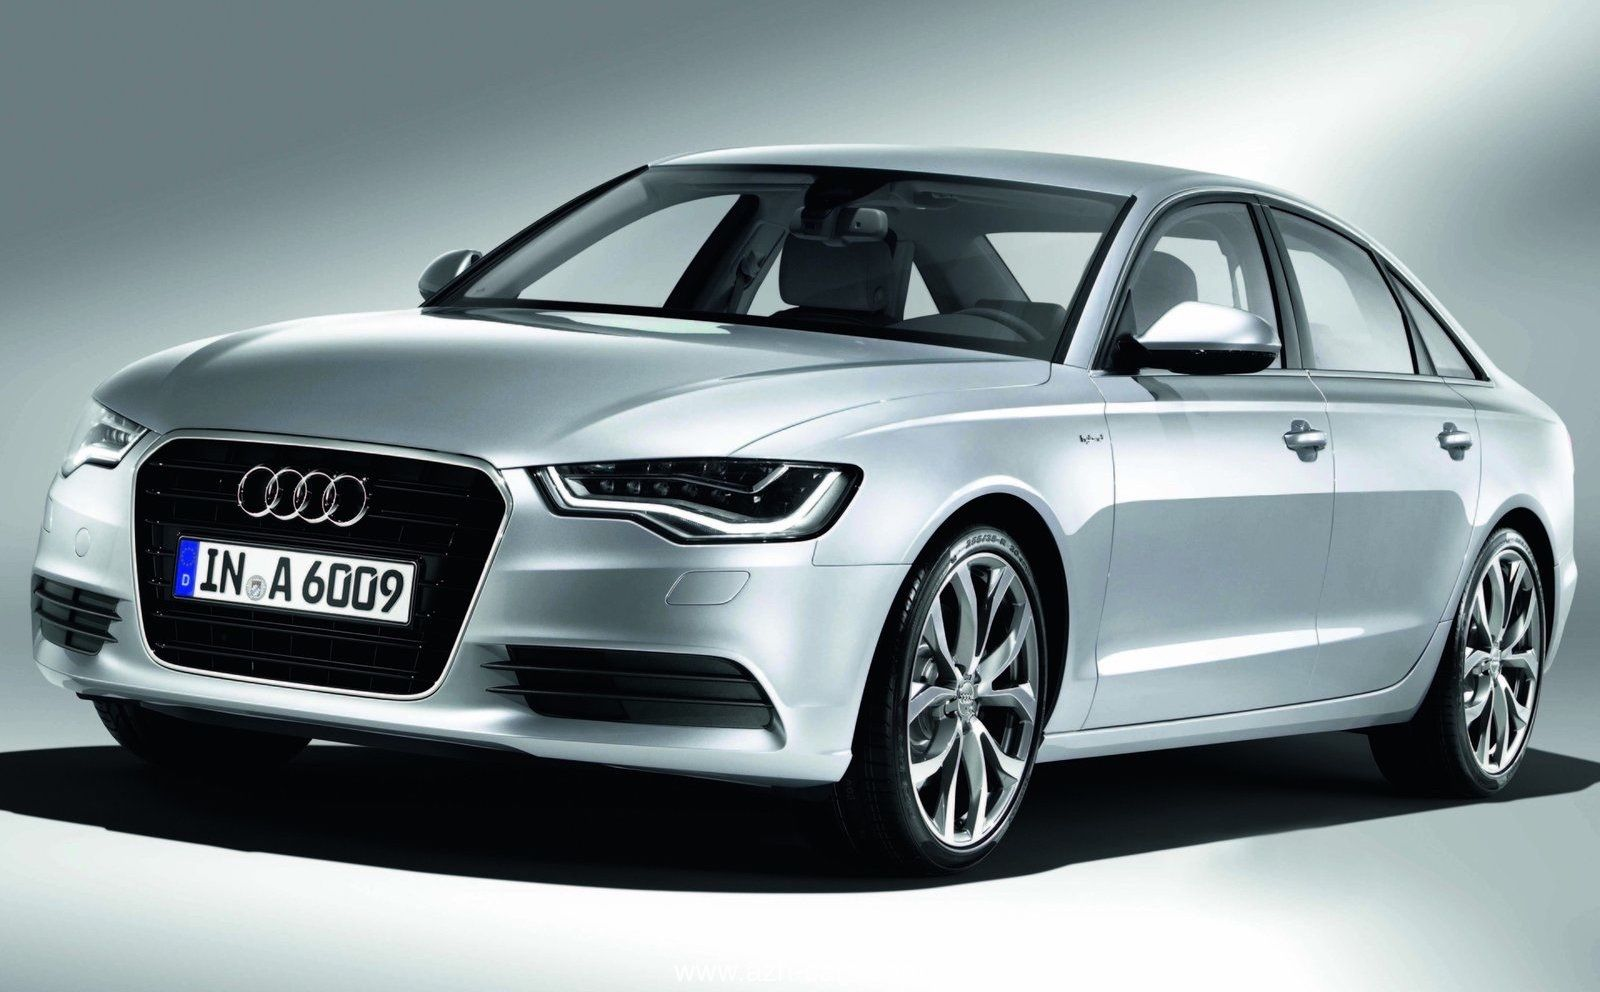 Audi A6 Hybrid 2012 Audi Audi A6 Bmw 535i